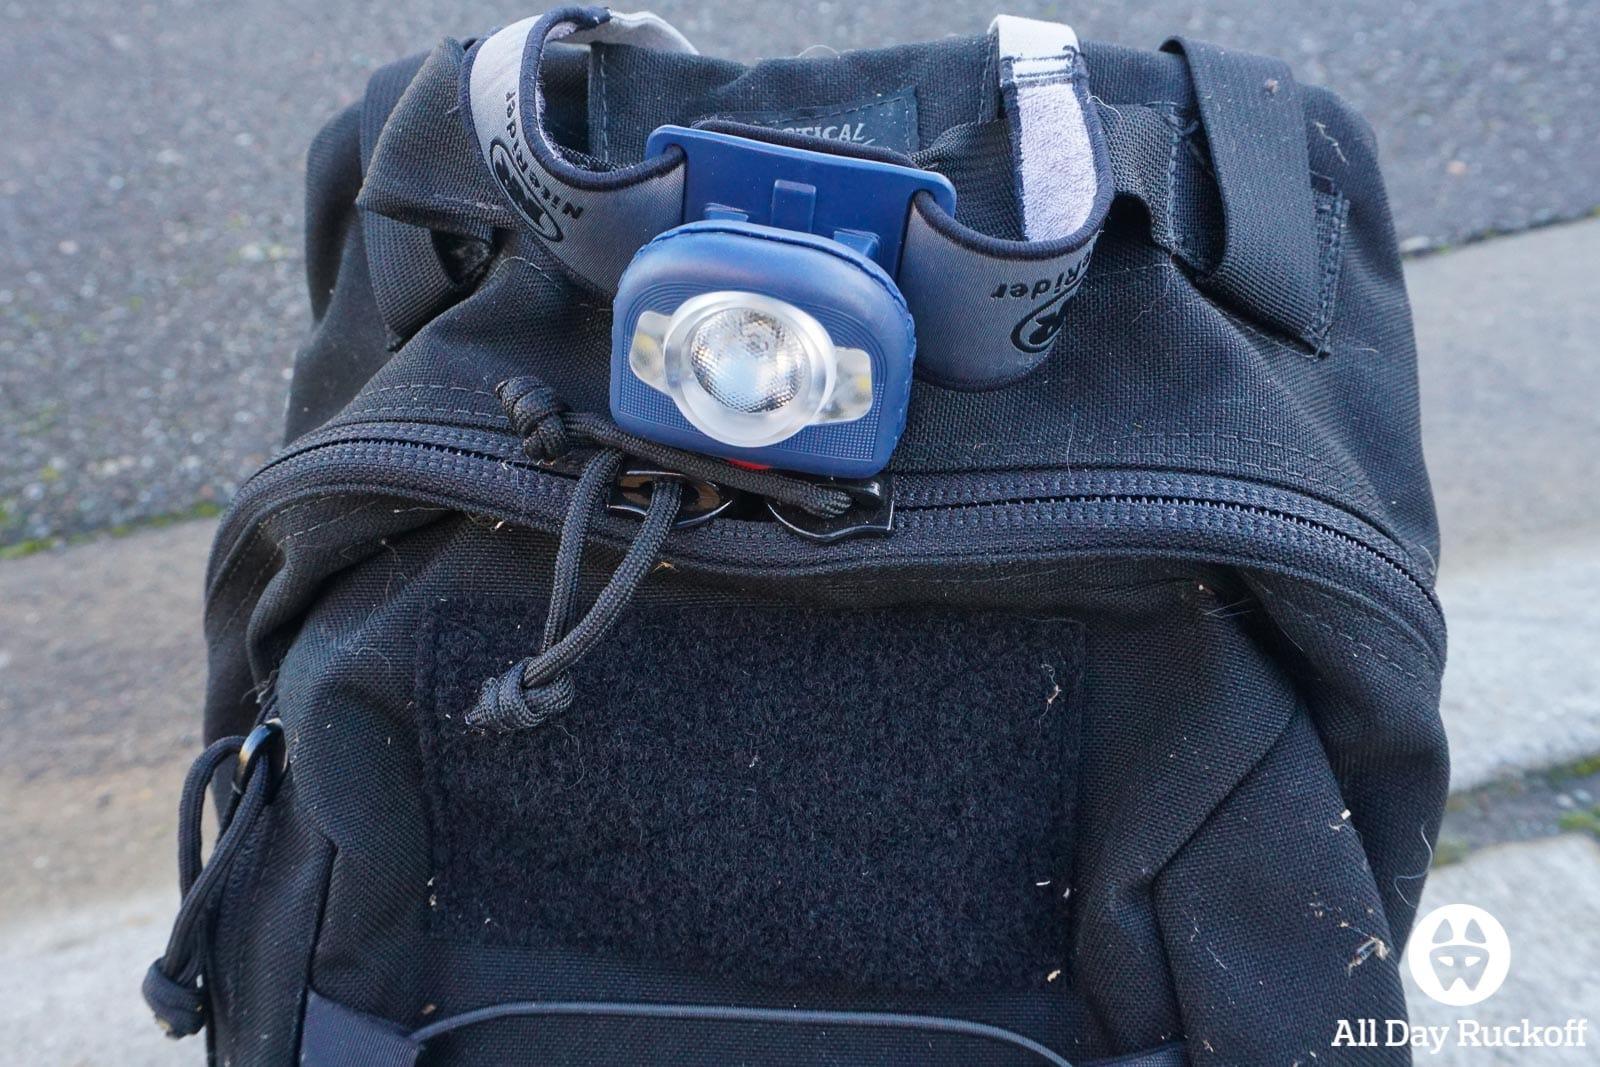 NiteRider Adventure 180 - TT Pack